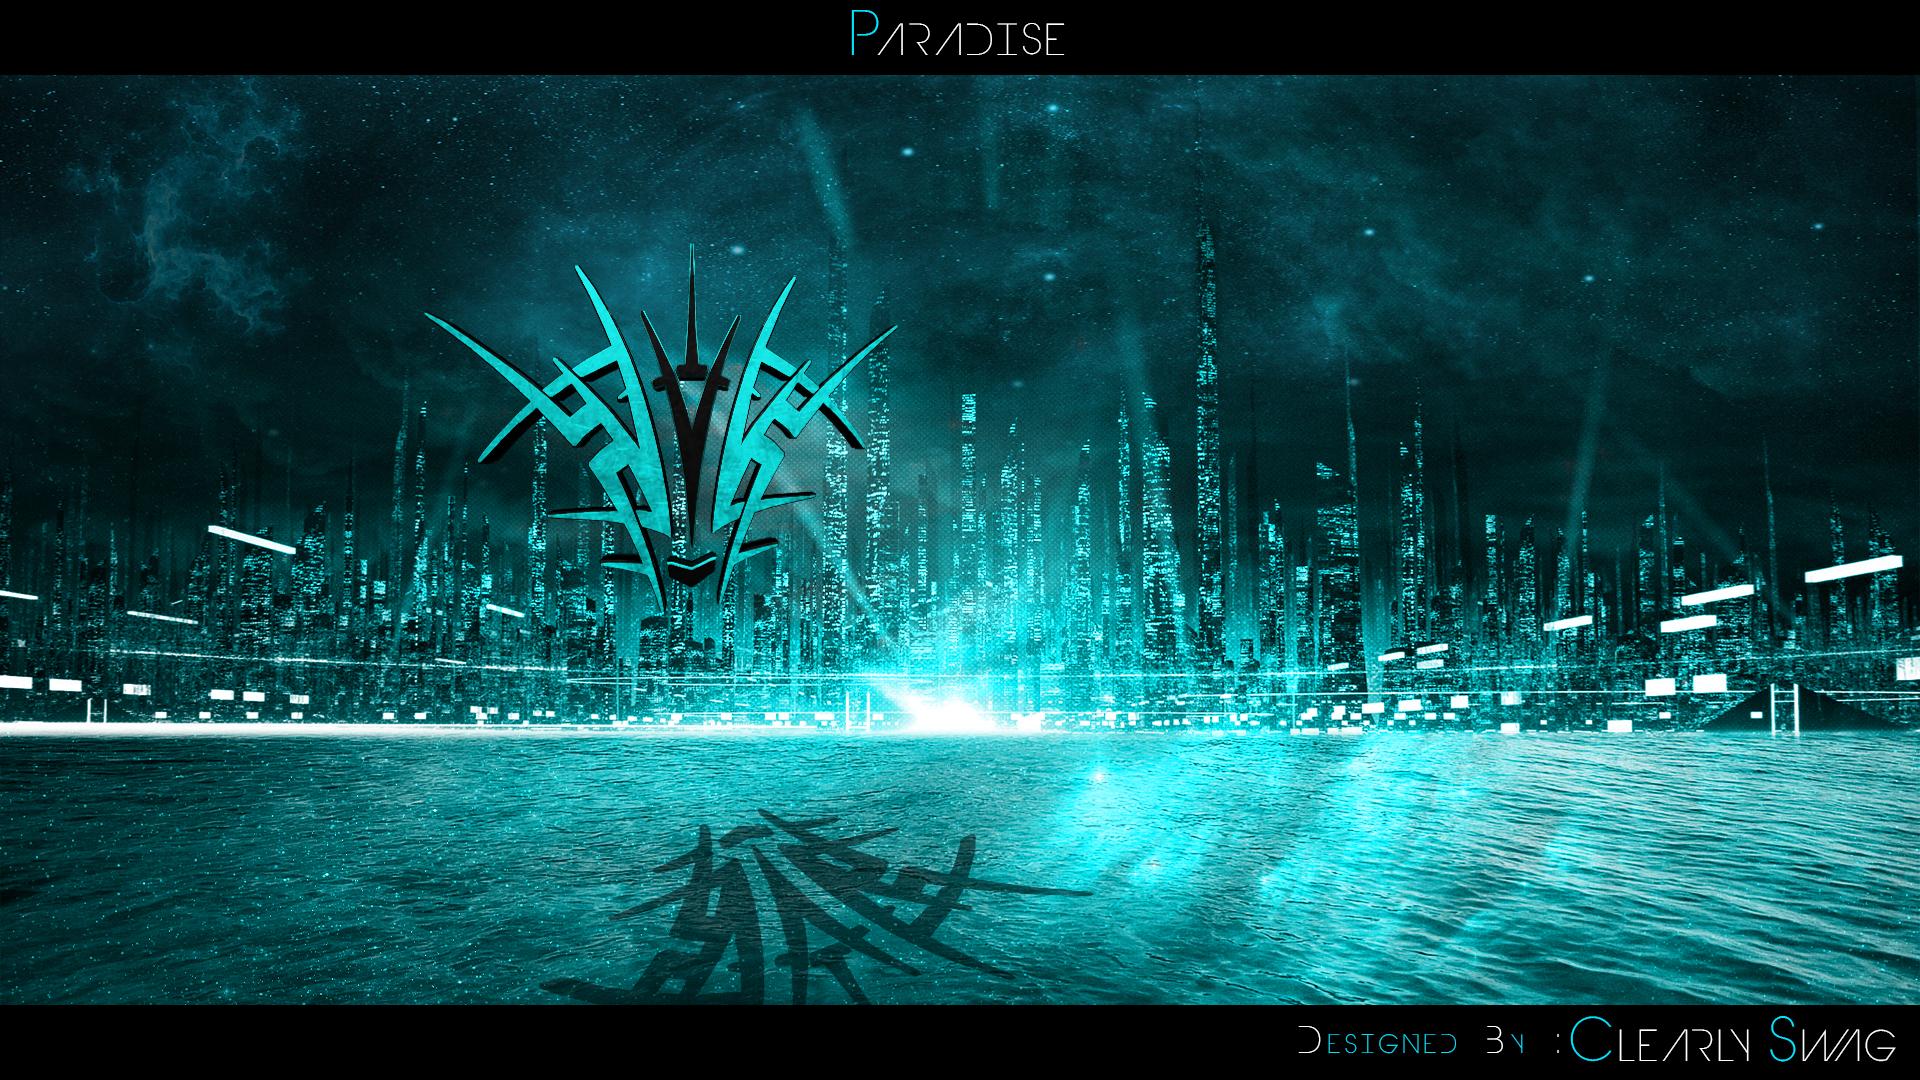 Paradise. by PrideeGFX